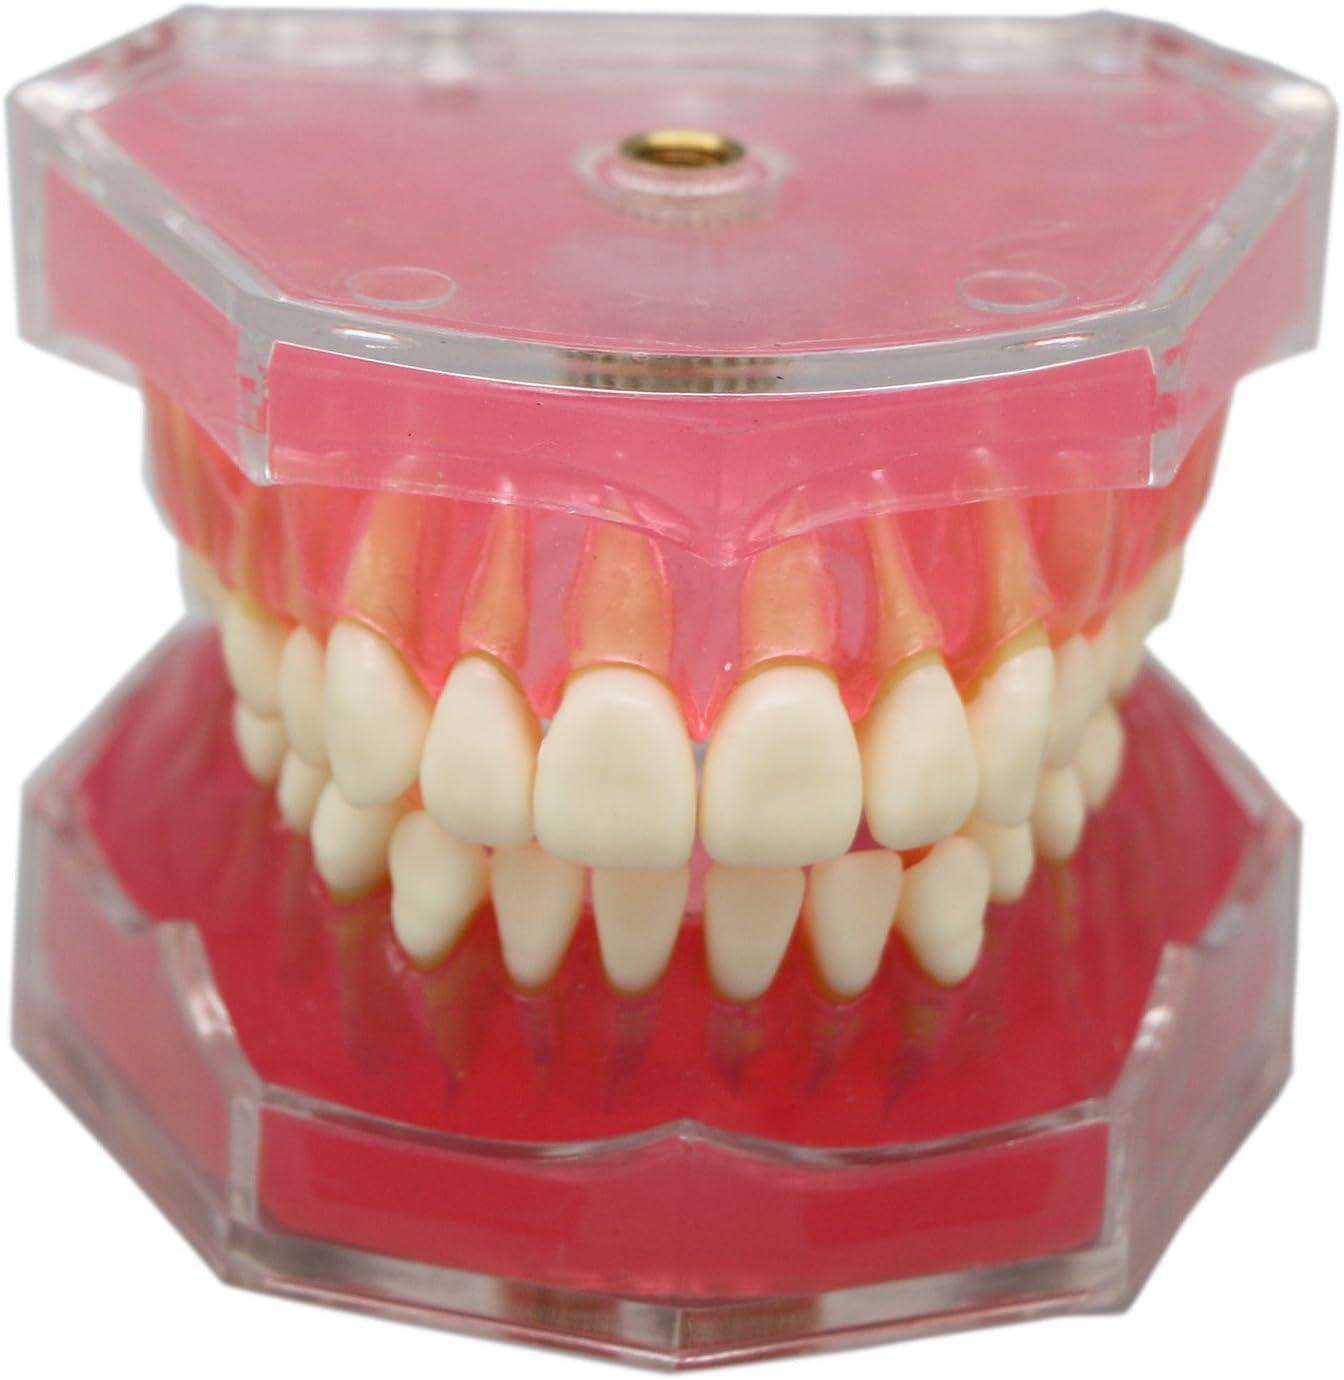 Dentalmall® 1 Pc Dental Demonstration teeth Model - Standard Study Teaching dental mode with all Removable Teeth #4004 01